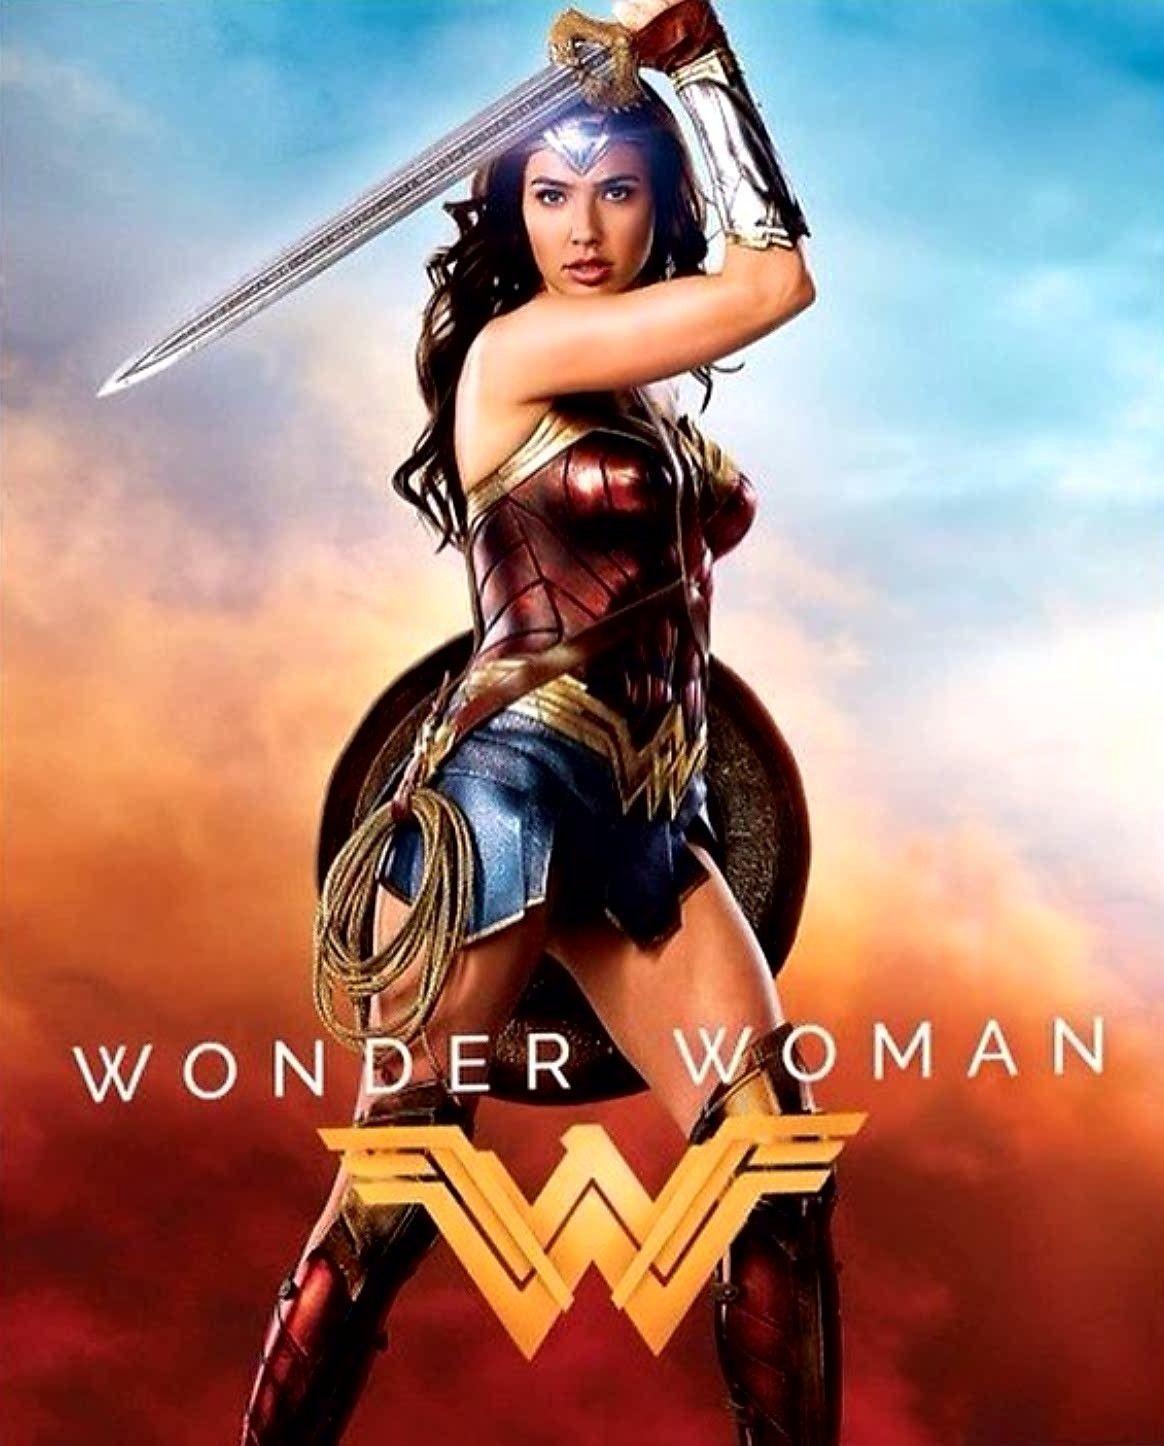 Pin By Mohammed Ashraf On Worlds Of Dc The Cinematic Universe Wonder Woman Gal Gadot Wonder Woman Wonder Woman Movie